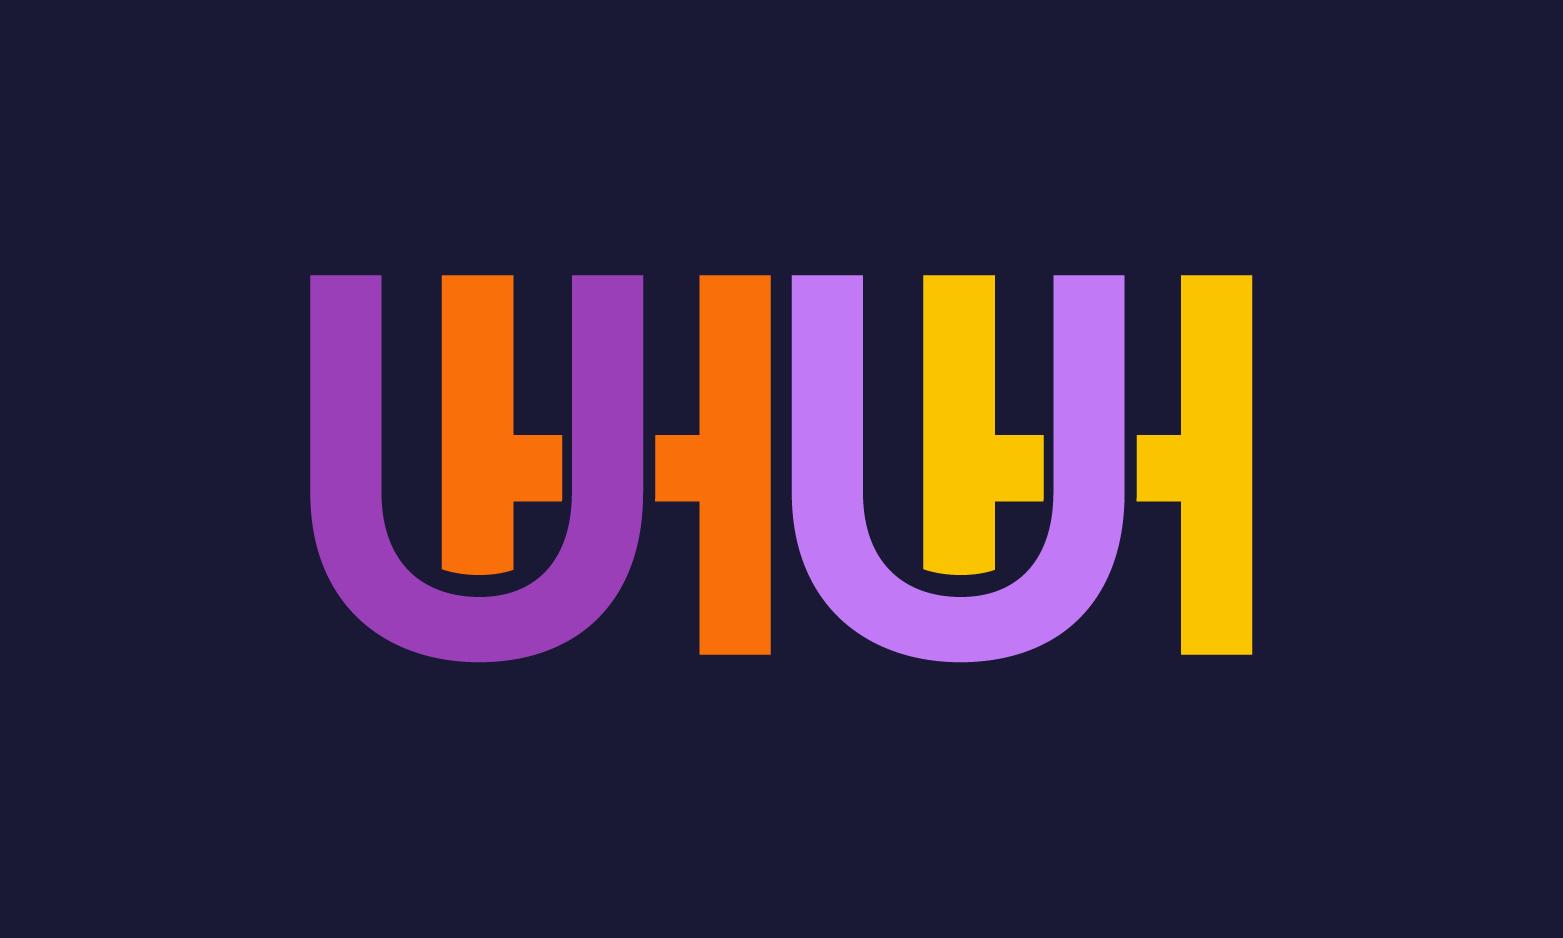 Uhuh.com